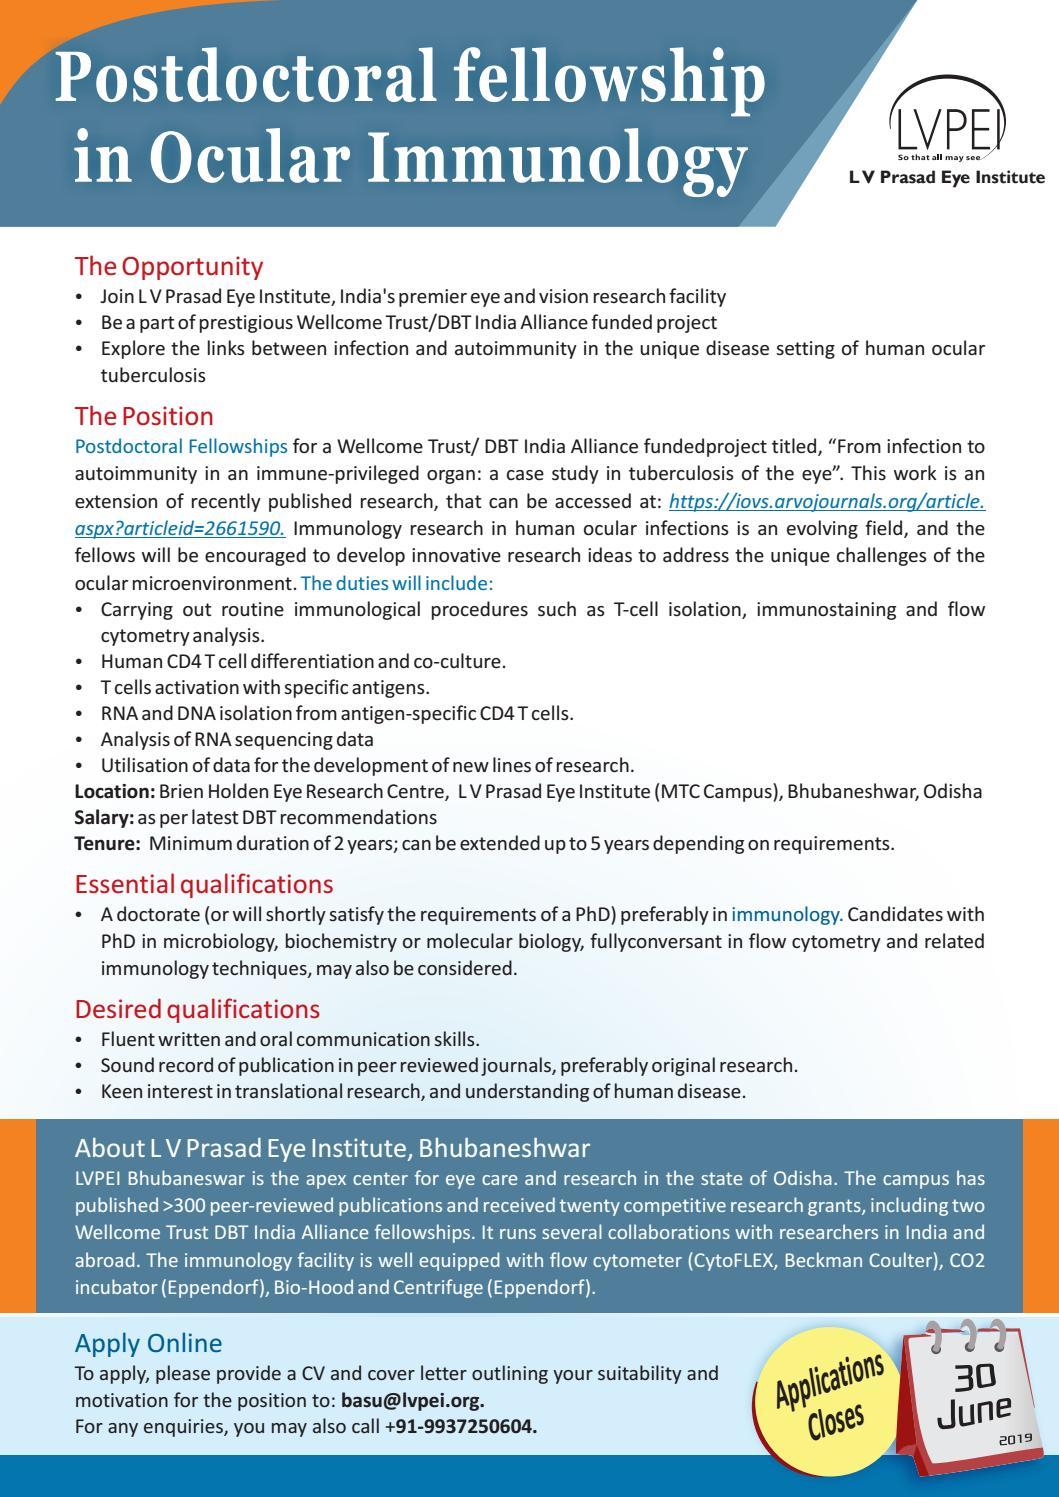 Wellcome Trust/ DBT PostDoc Fellowship Project in Ocular